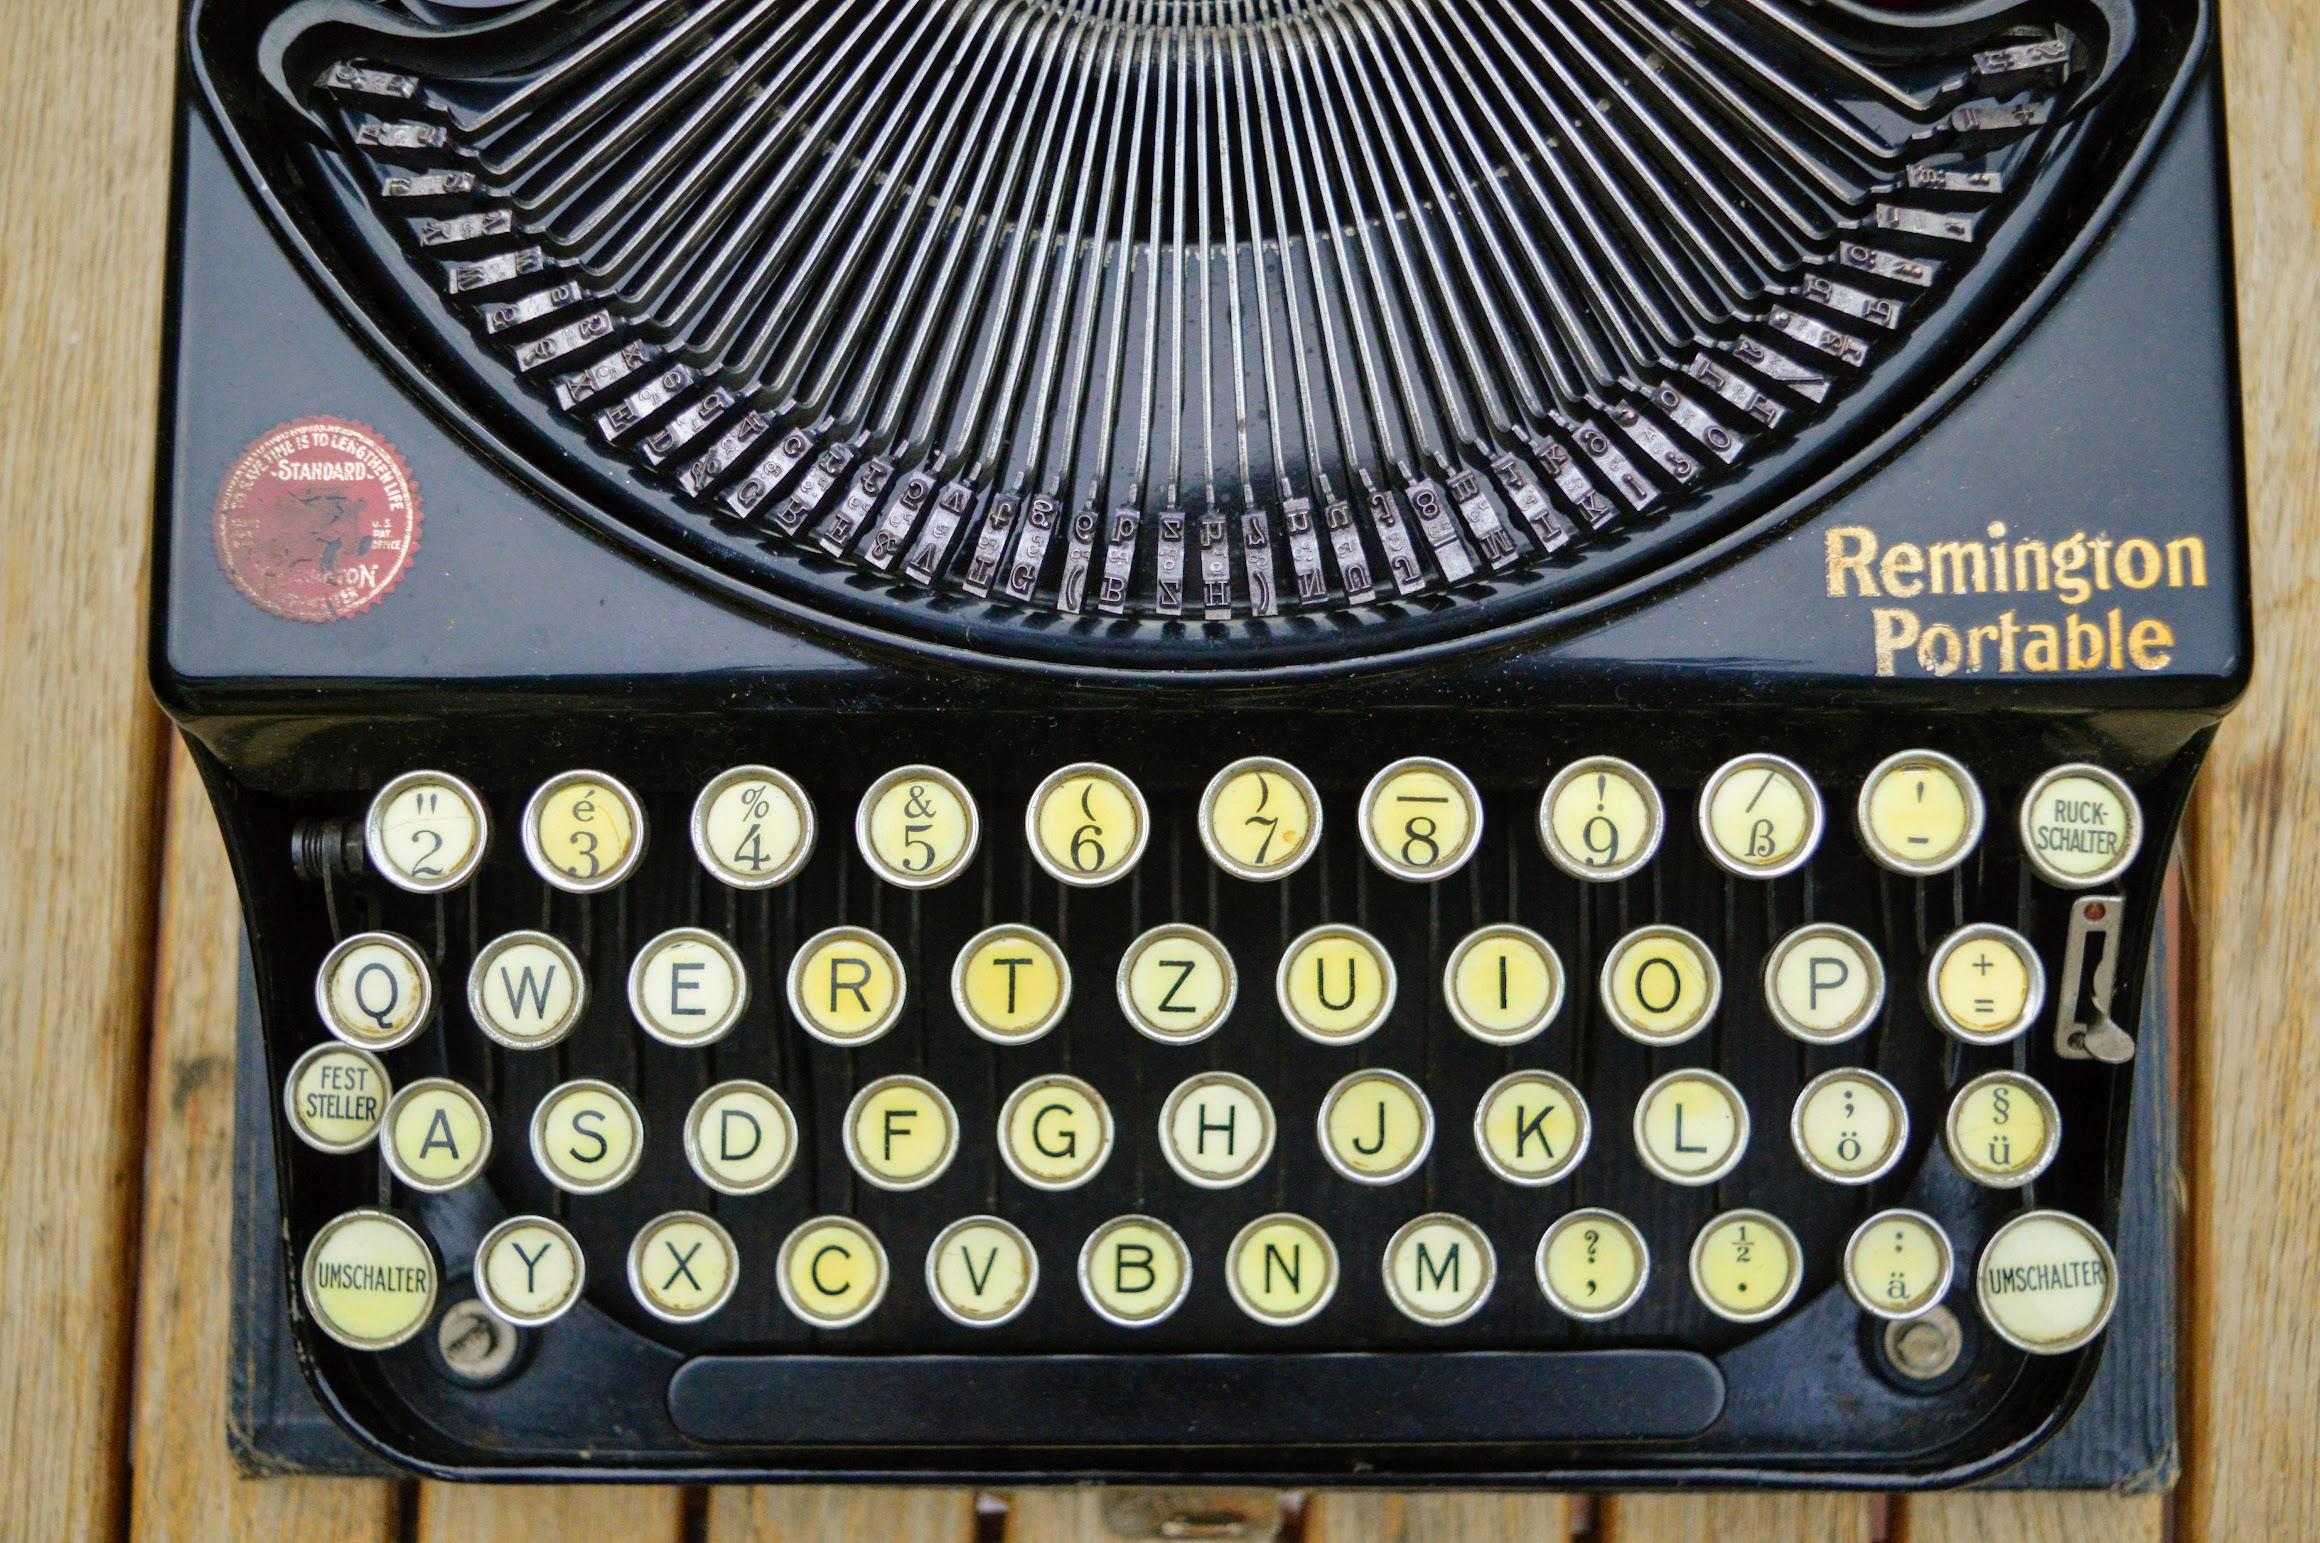 Remington Portable - Tastatur